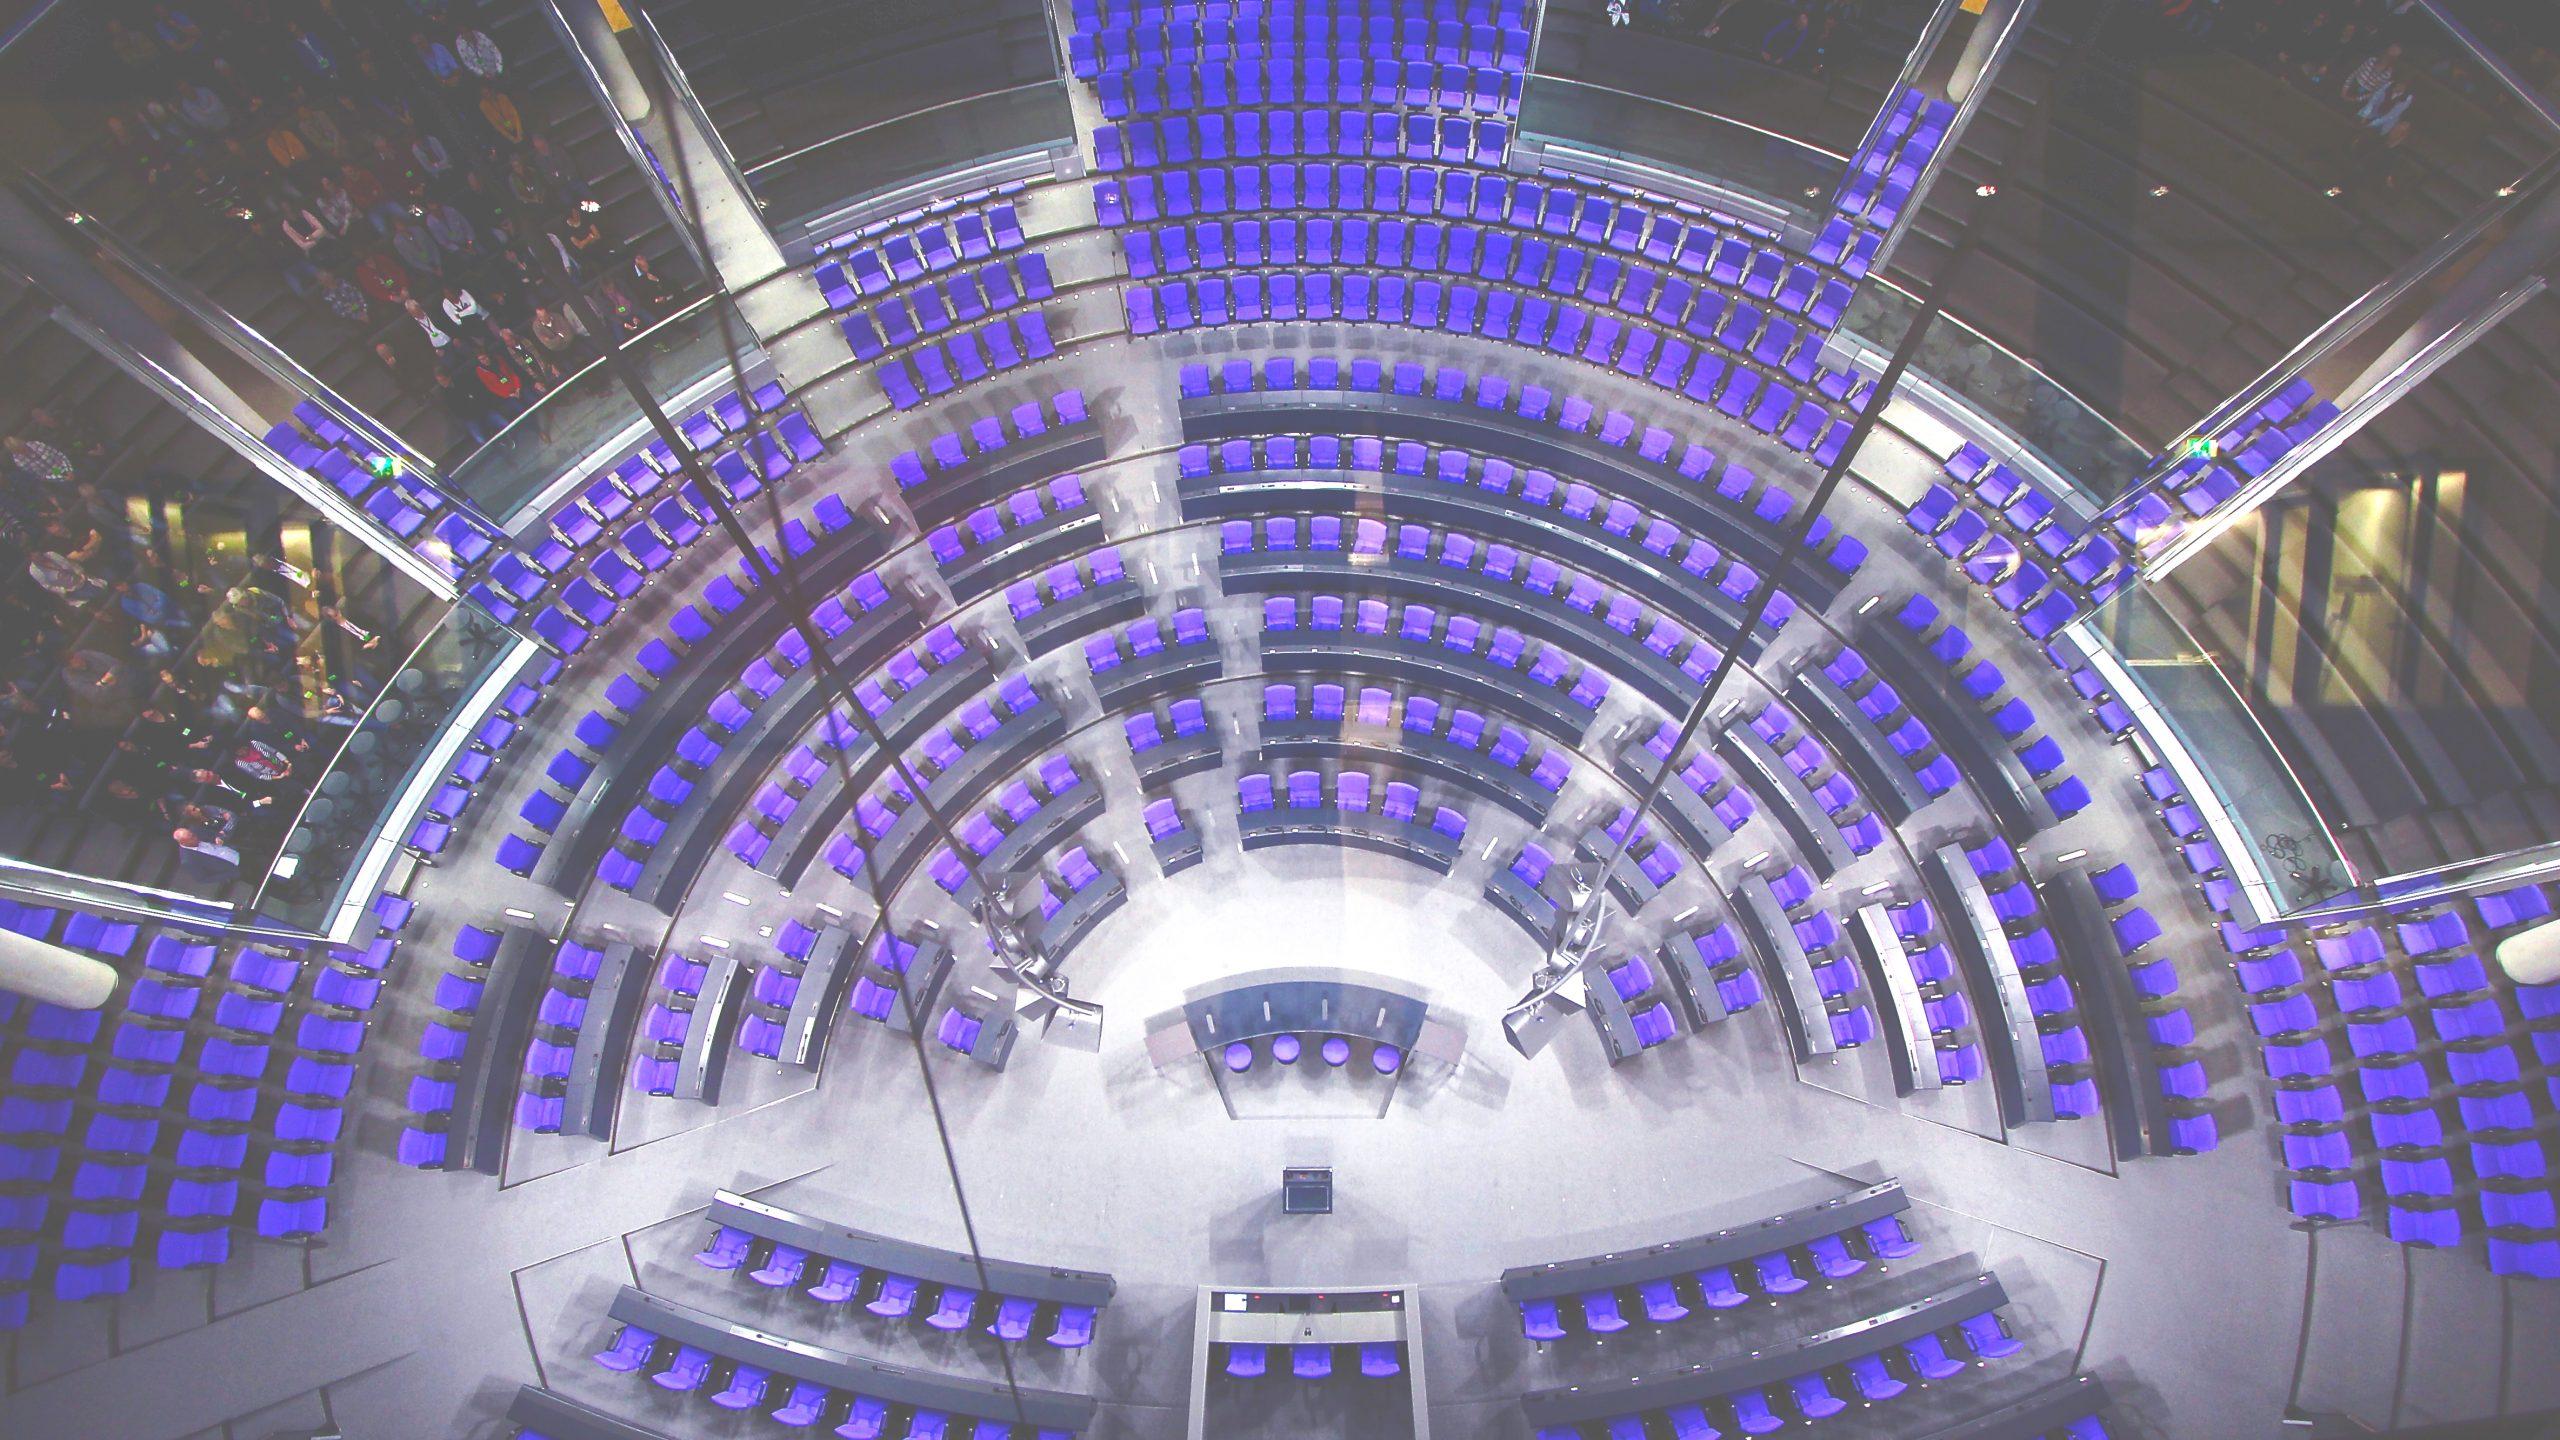 Plenarsaal-bearbeitet-scaled.jpg